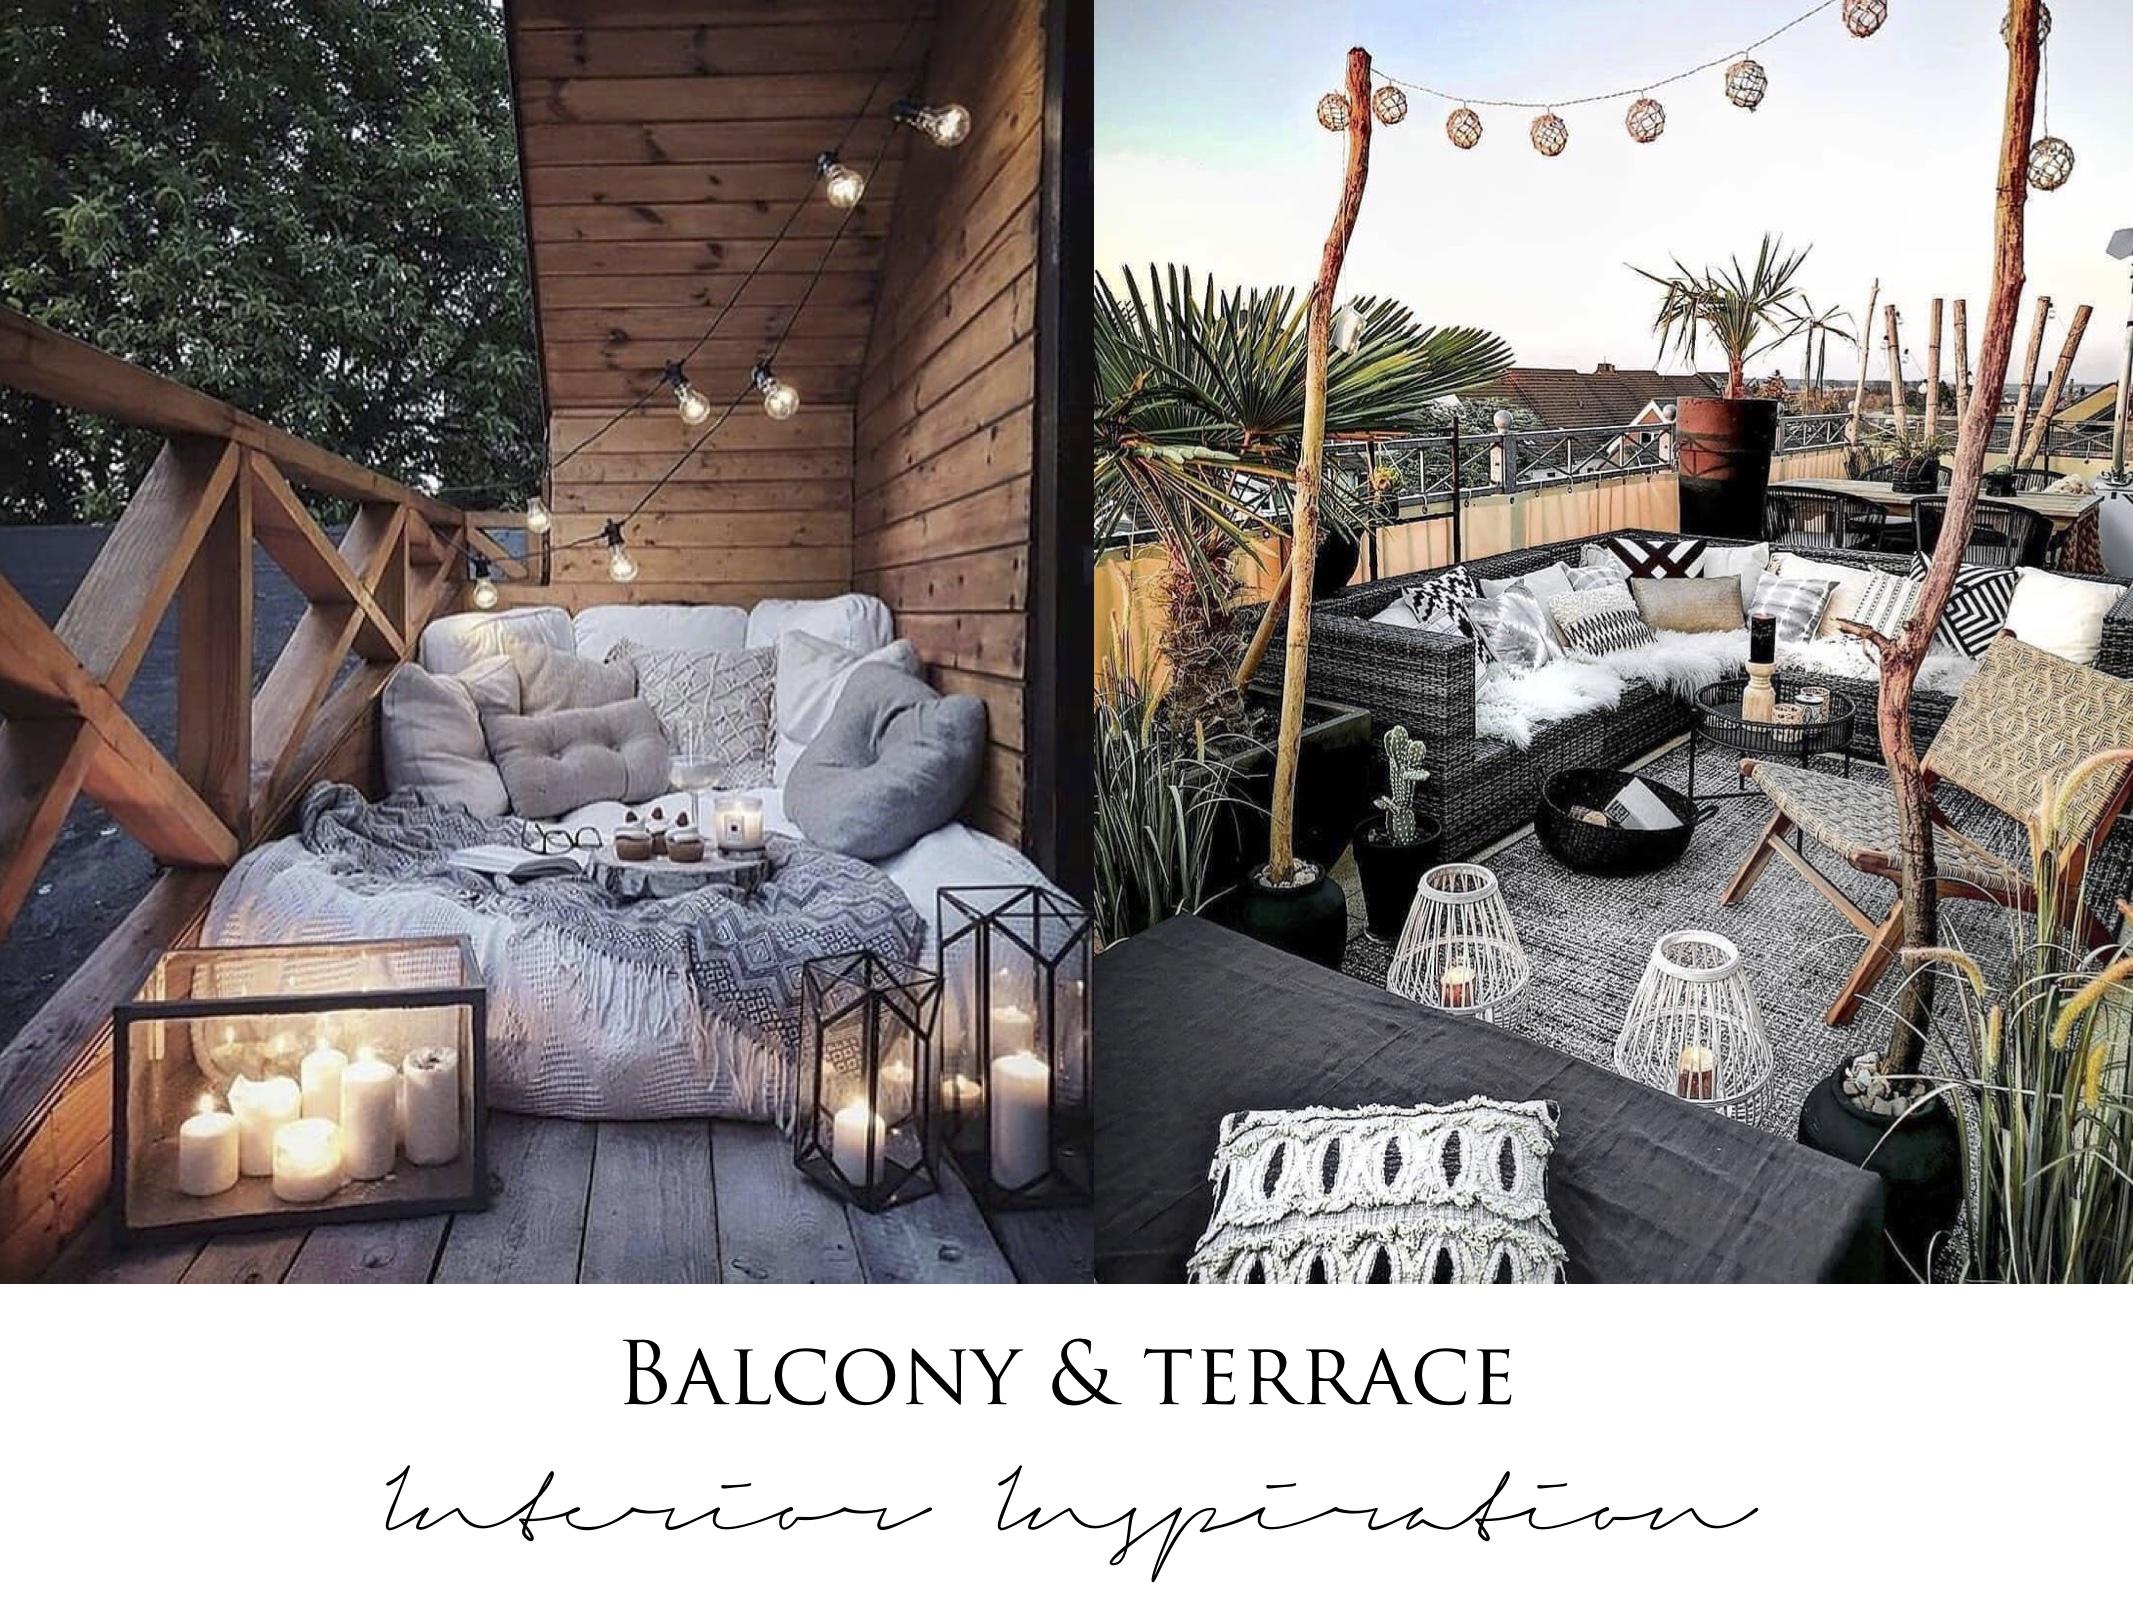 Balkon Ideen Inspirationen Fur Deine Outdoor Oase